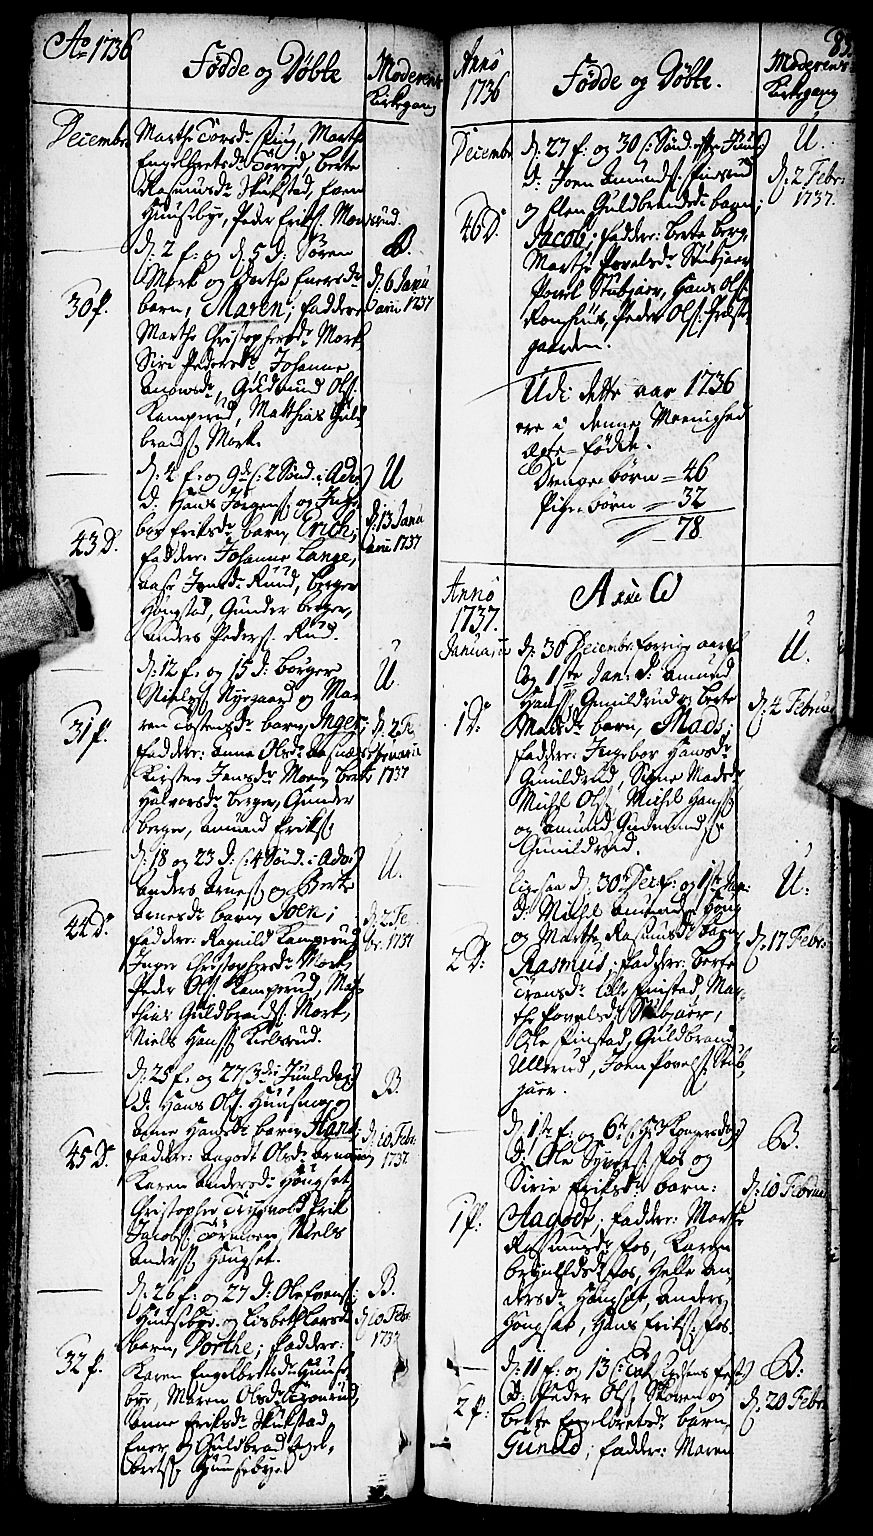 SAO, Aurskog prestekontor Kirkebøker, F/Fa/L0002: Ministerialbok nr. I 2, 1735-1766, s. 83